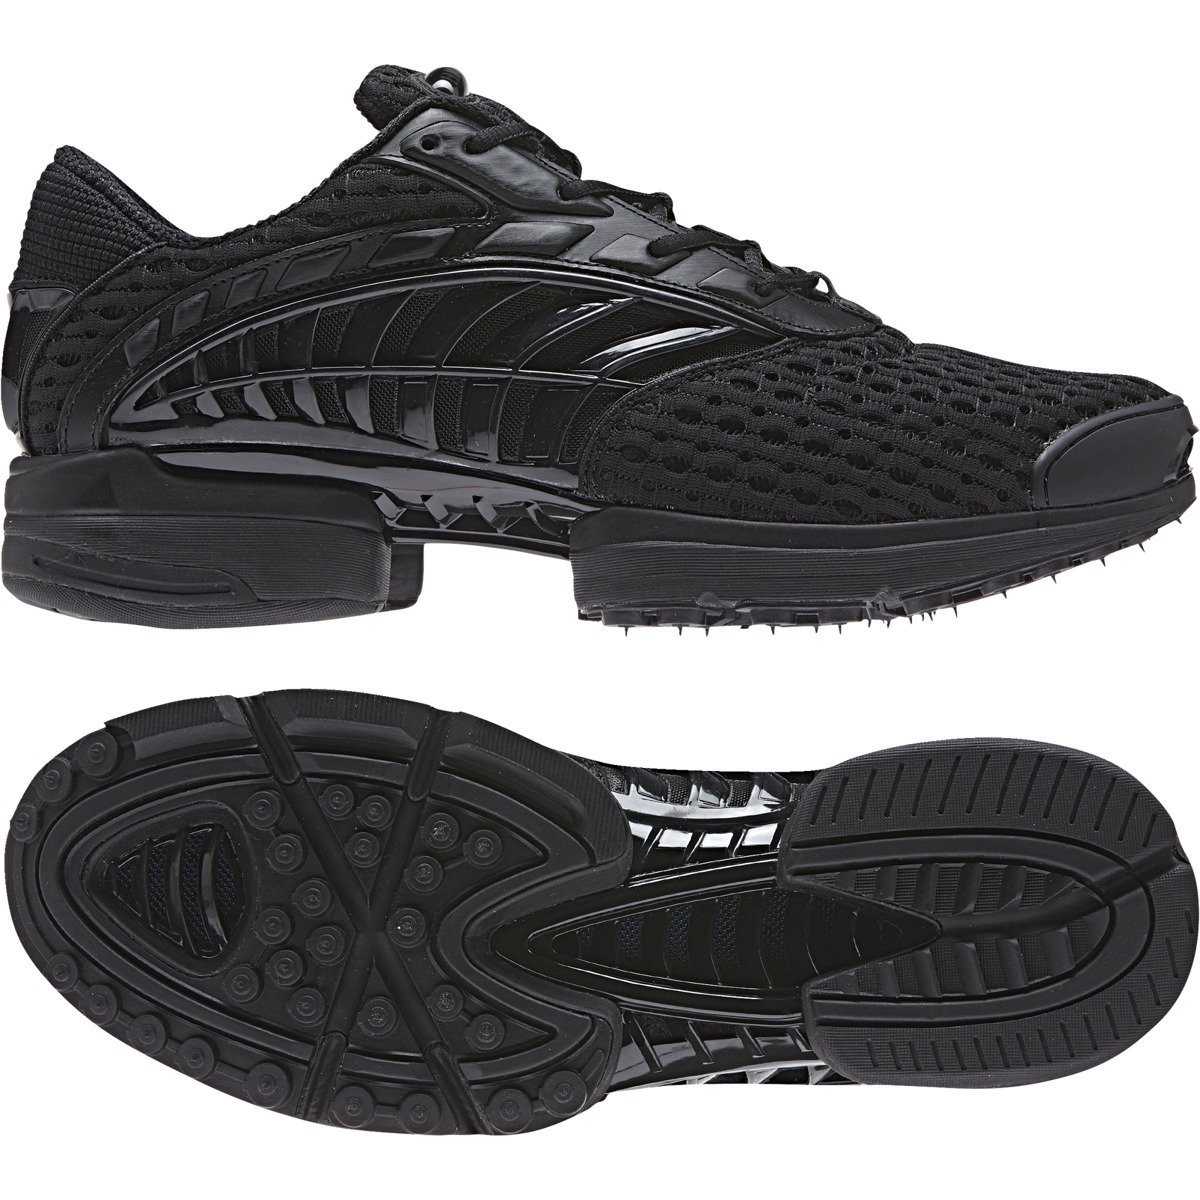 adidas Chaussures CLIMA COOL 2 Pas Cher Professionnel pQpiEqk